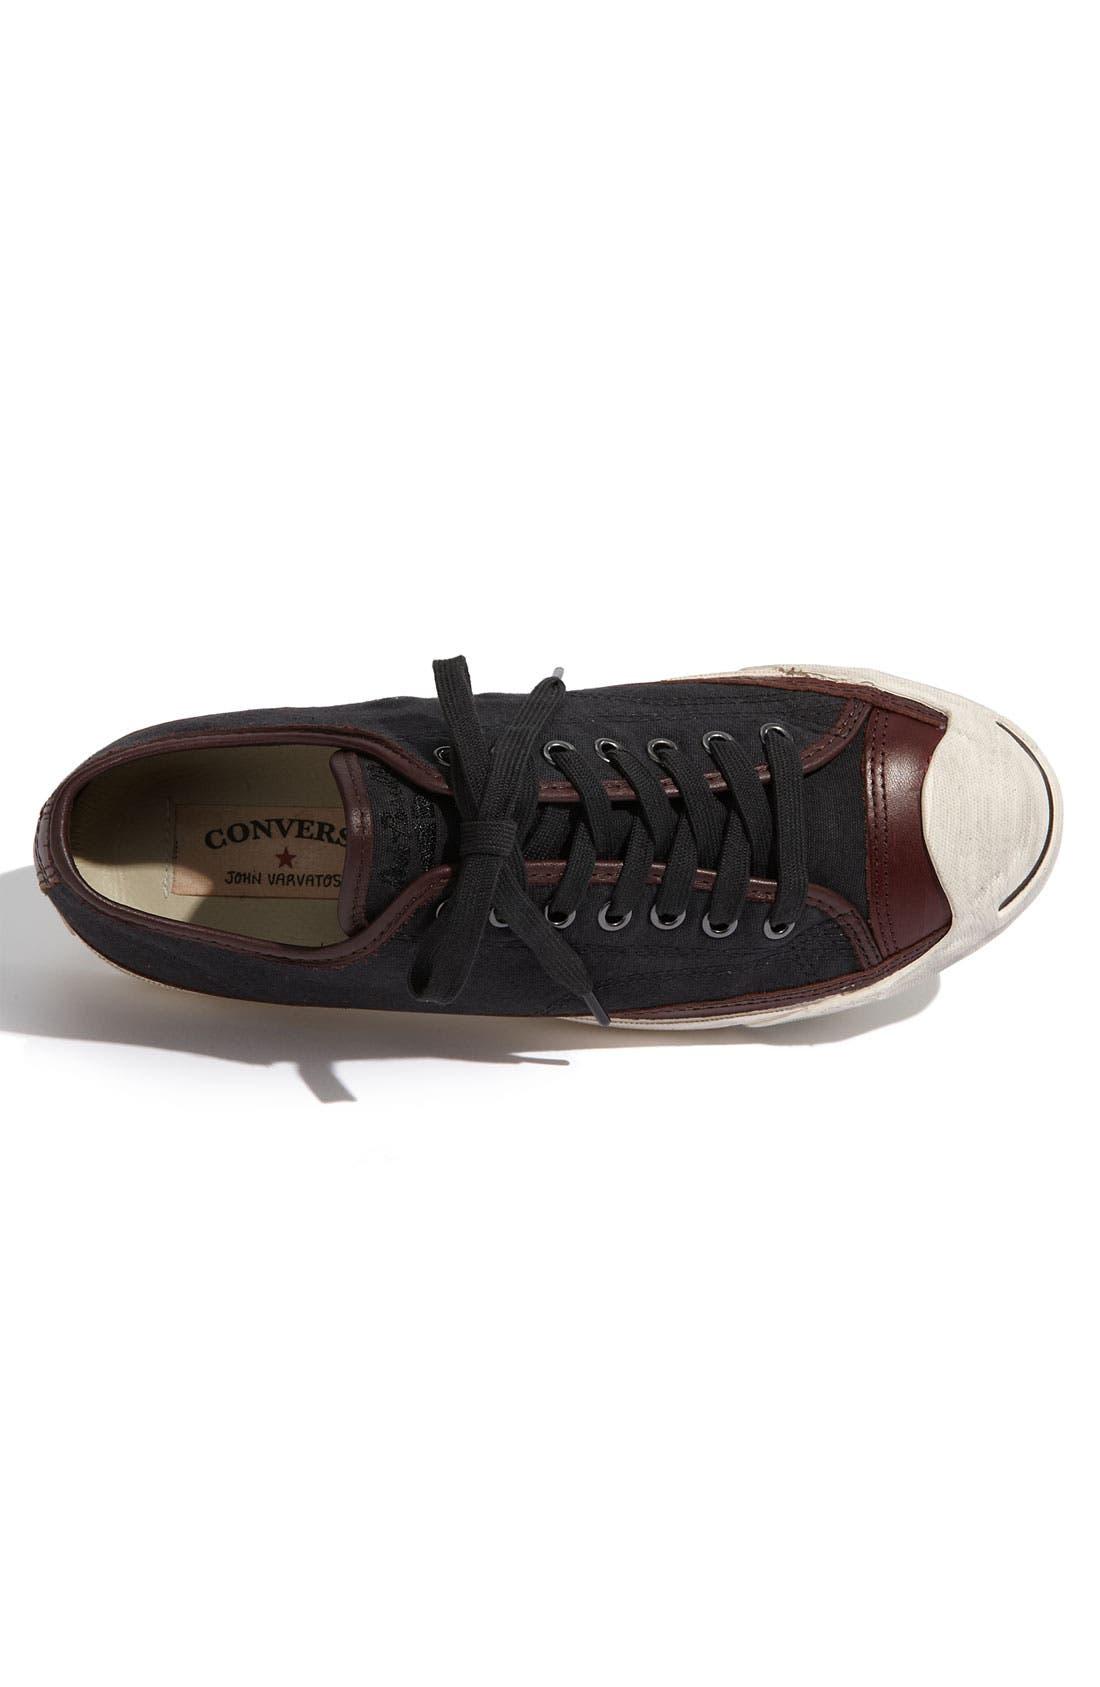 Alternate Image 3  - Converse by John Varvatos 'Jack Purcell Vintage' Sneaker (Men)